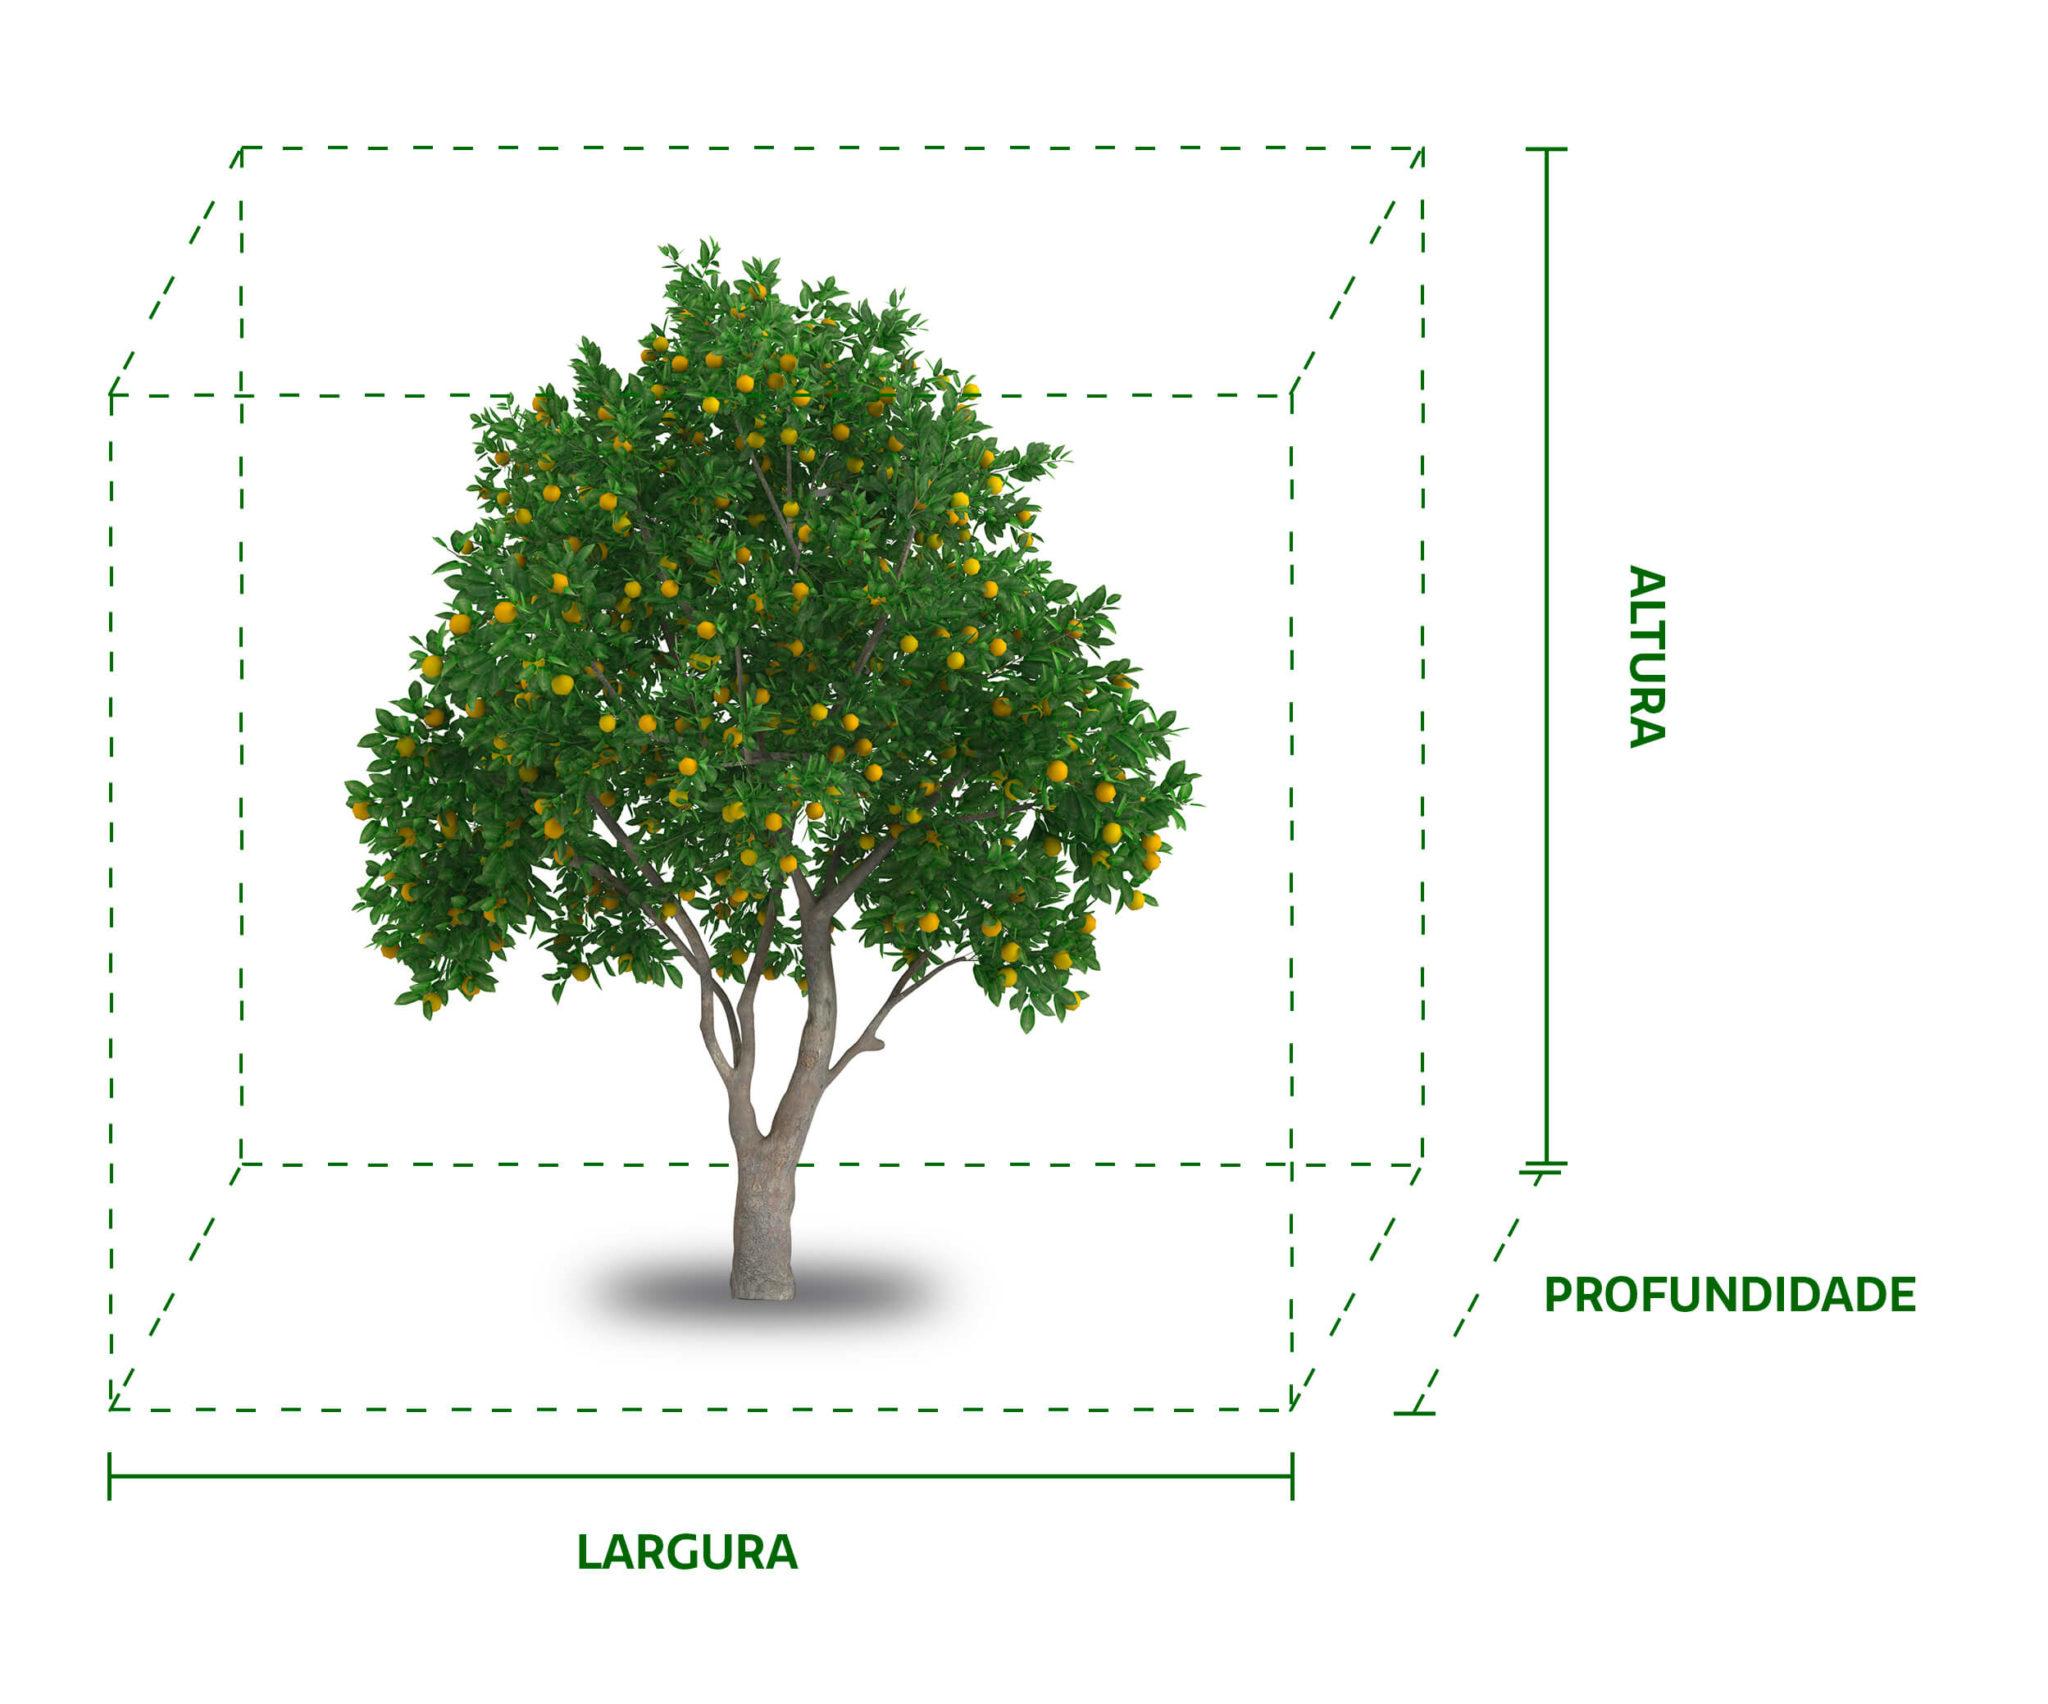 GRANBLACK Fertilizante Foliar Organomineral Premium Como Calcular a Cubicagem da Planta de Citrus